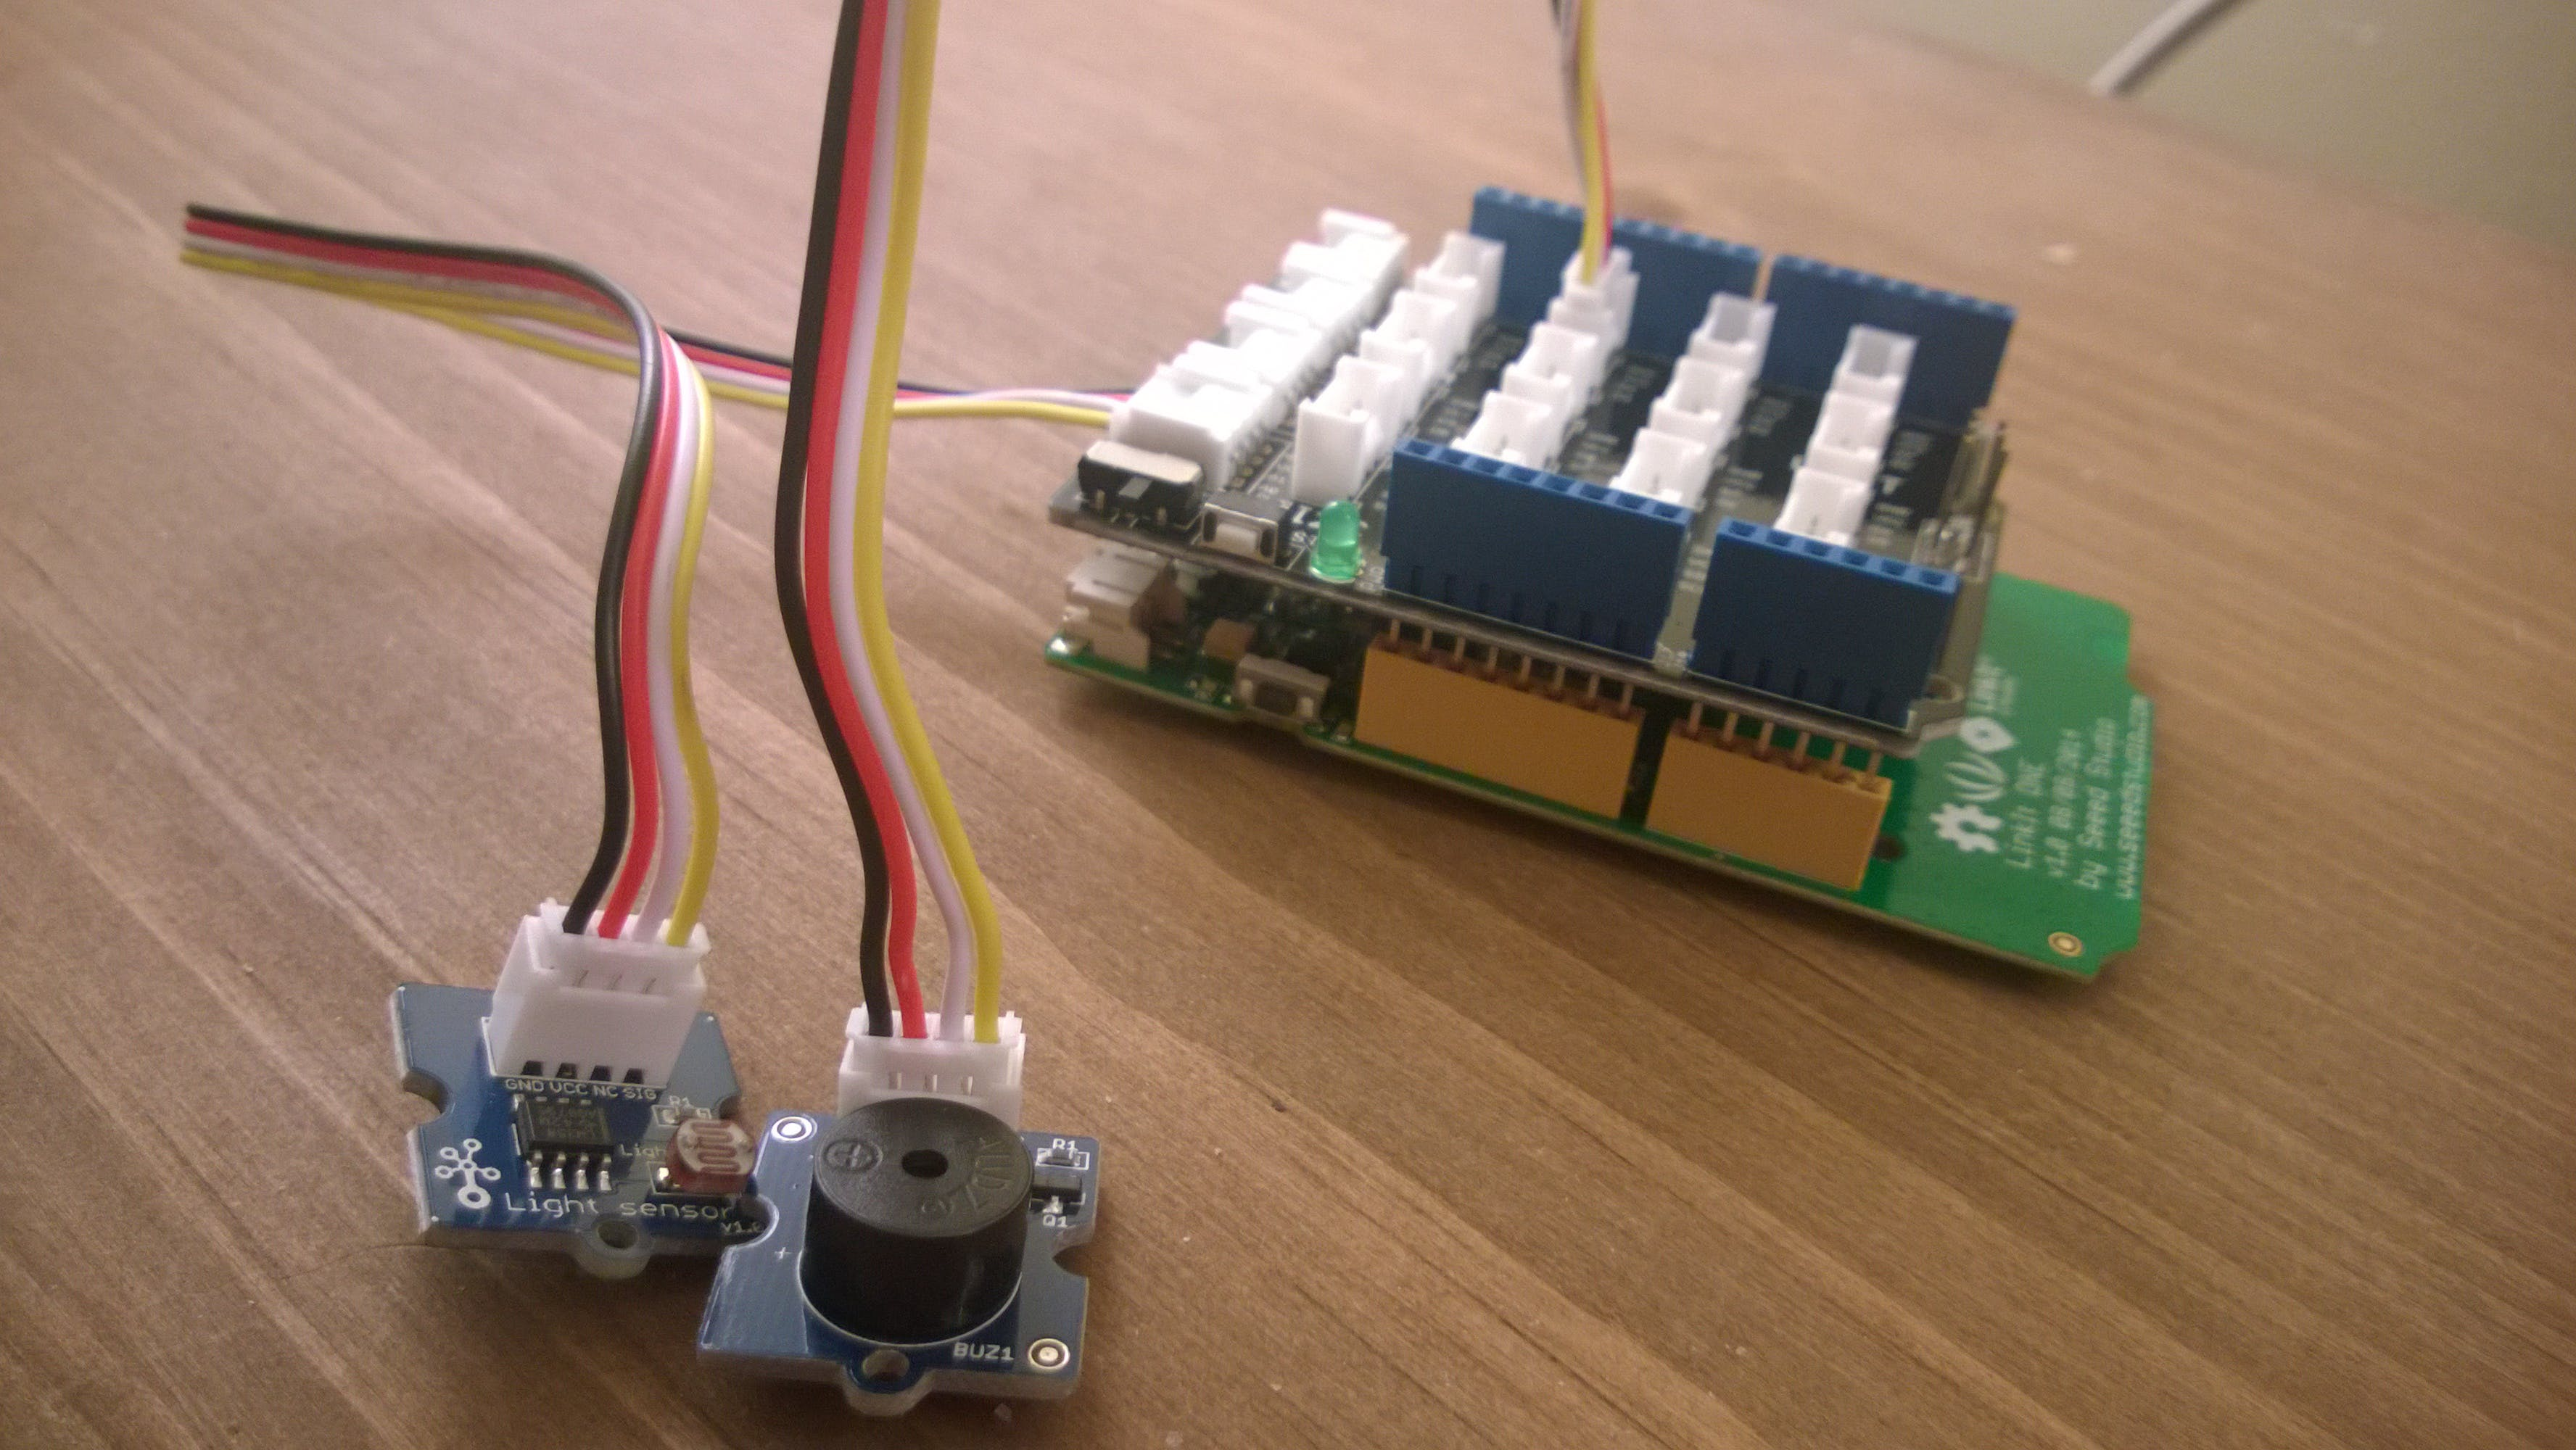 Light Sensor plugs into A0, Buzzer into D3